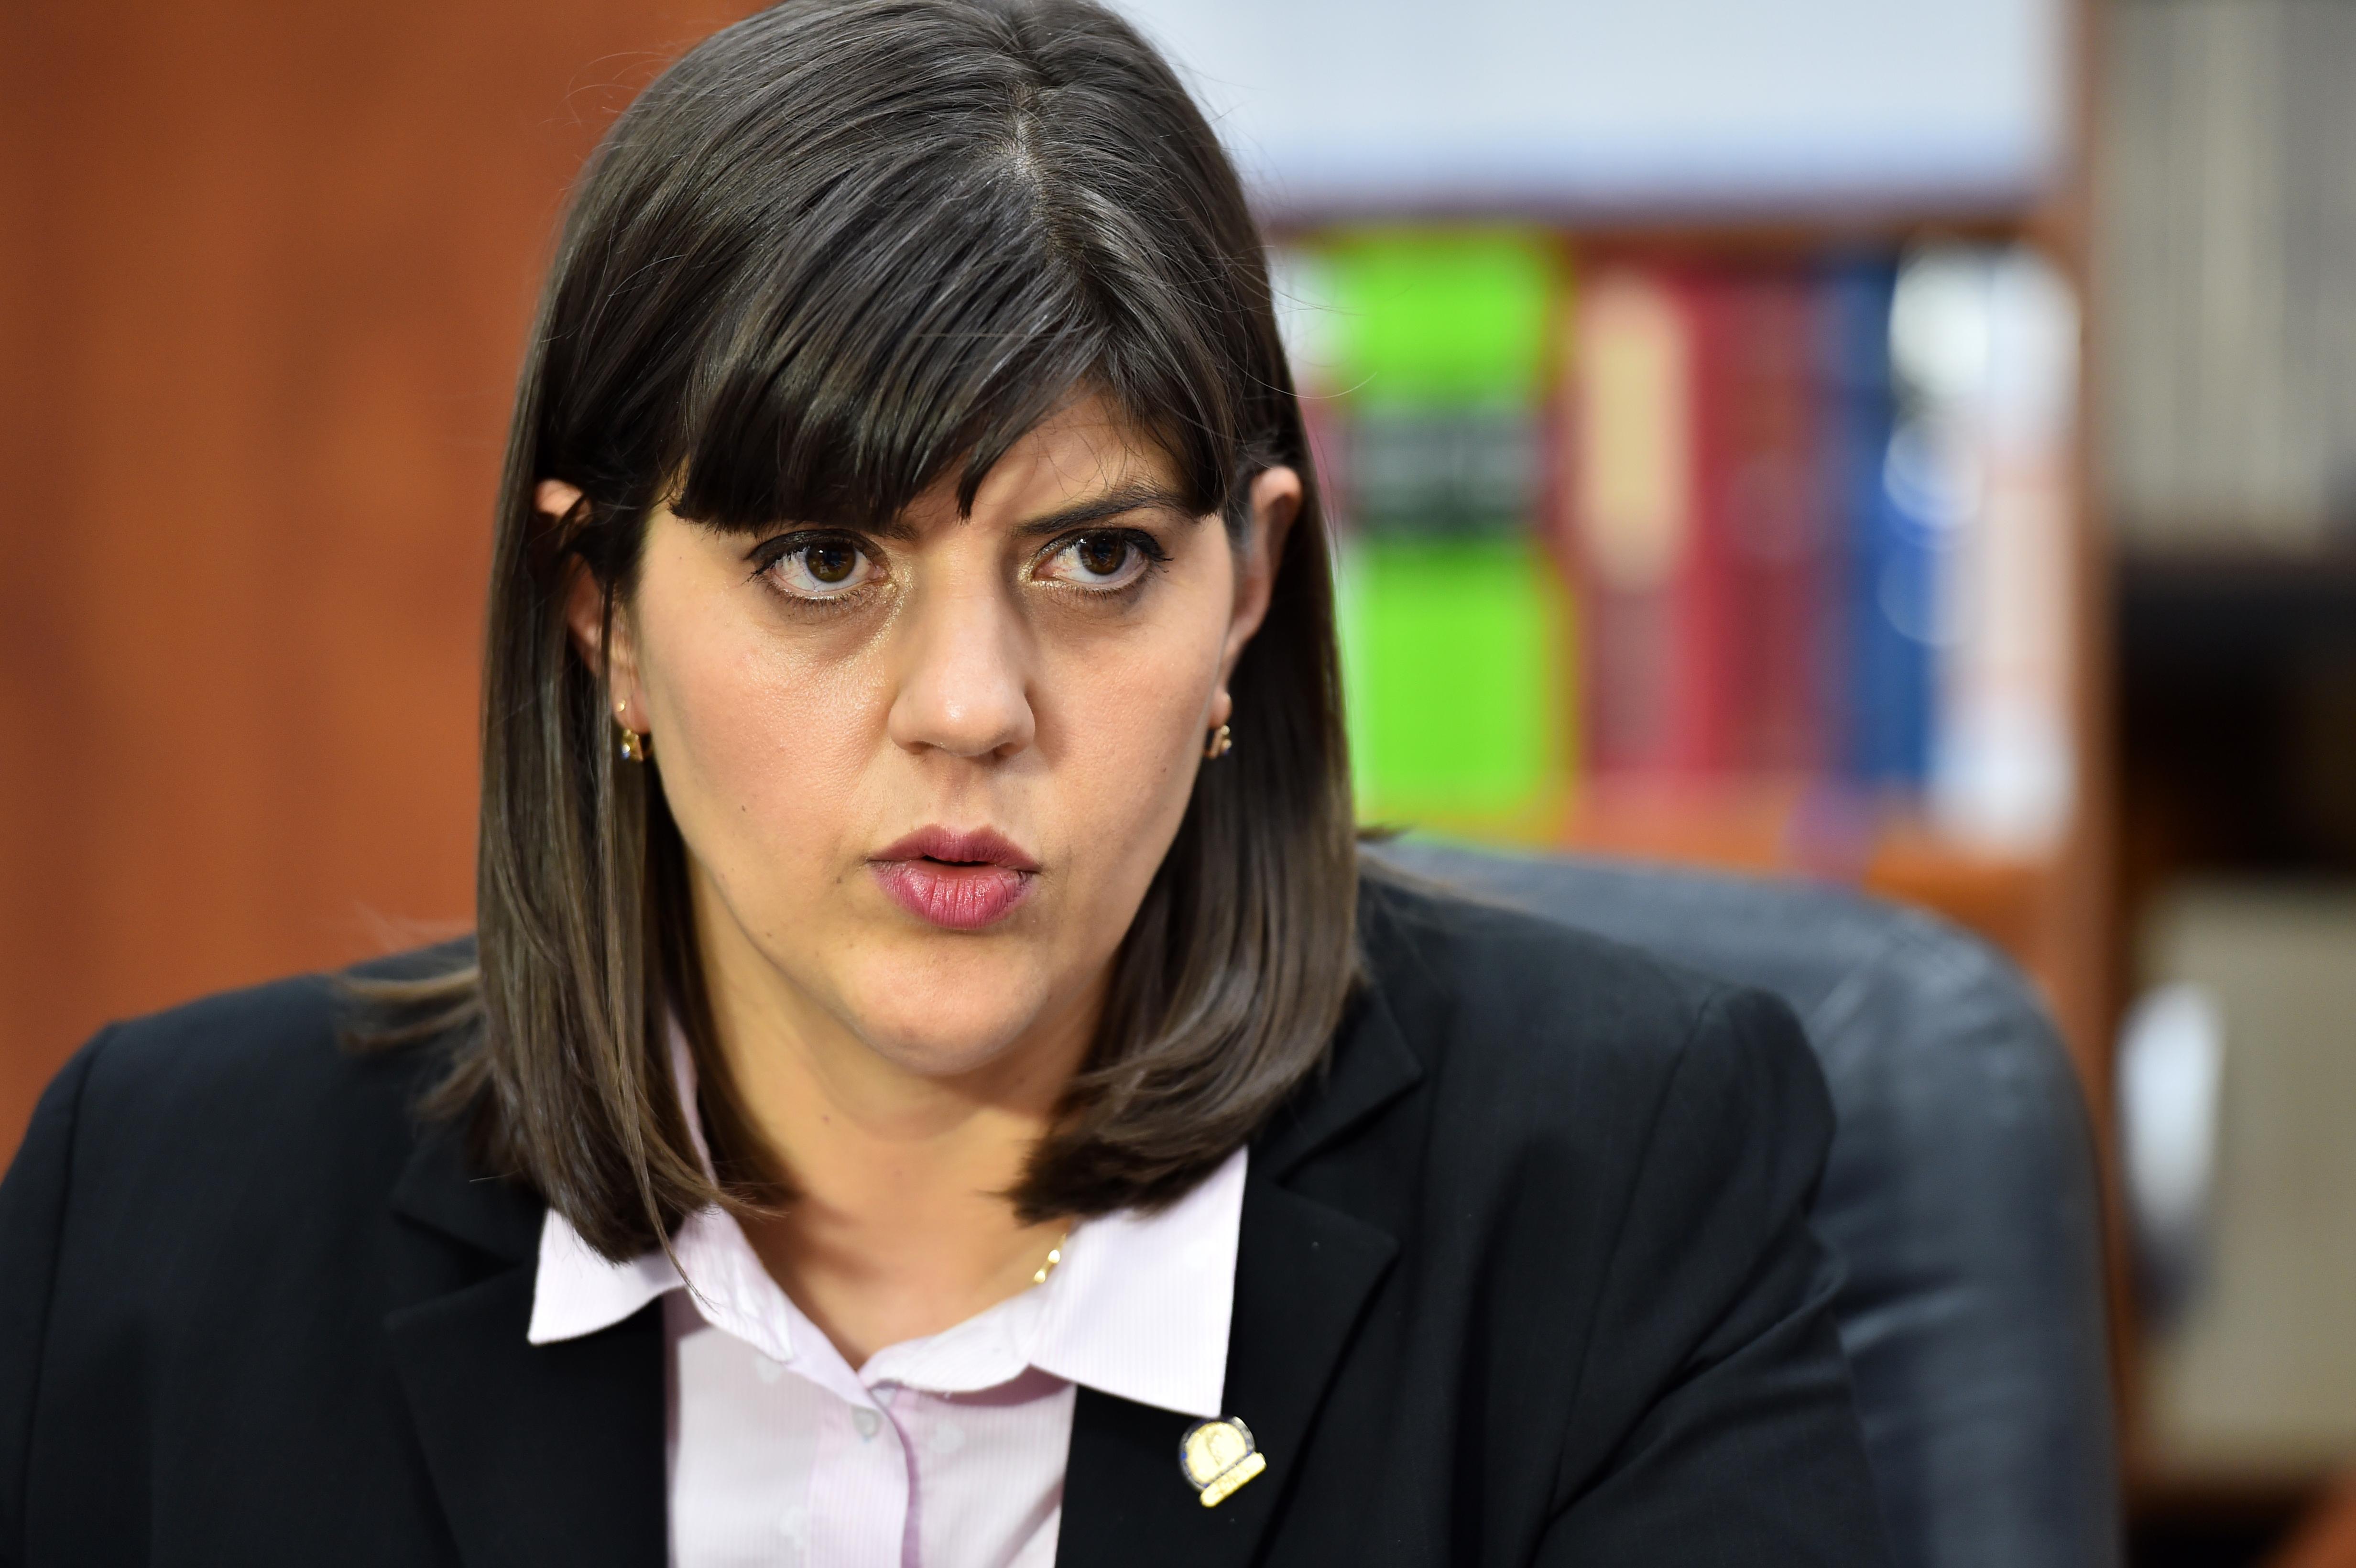 Surse Hotnews: Doi moguli media i-ar fi angajat pe israelienii care au spionat-o pe Laura Codruta Kovesi